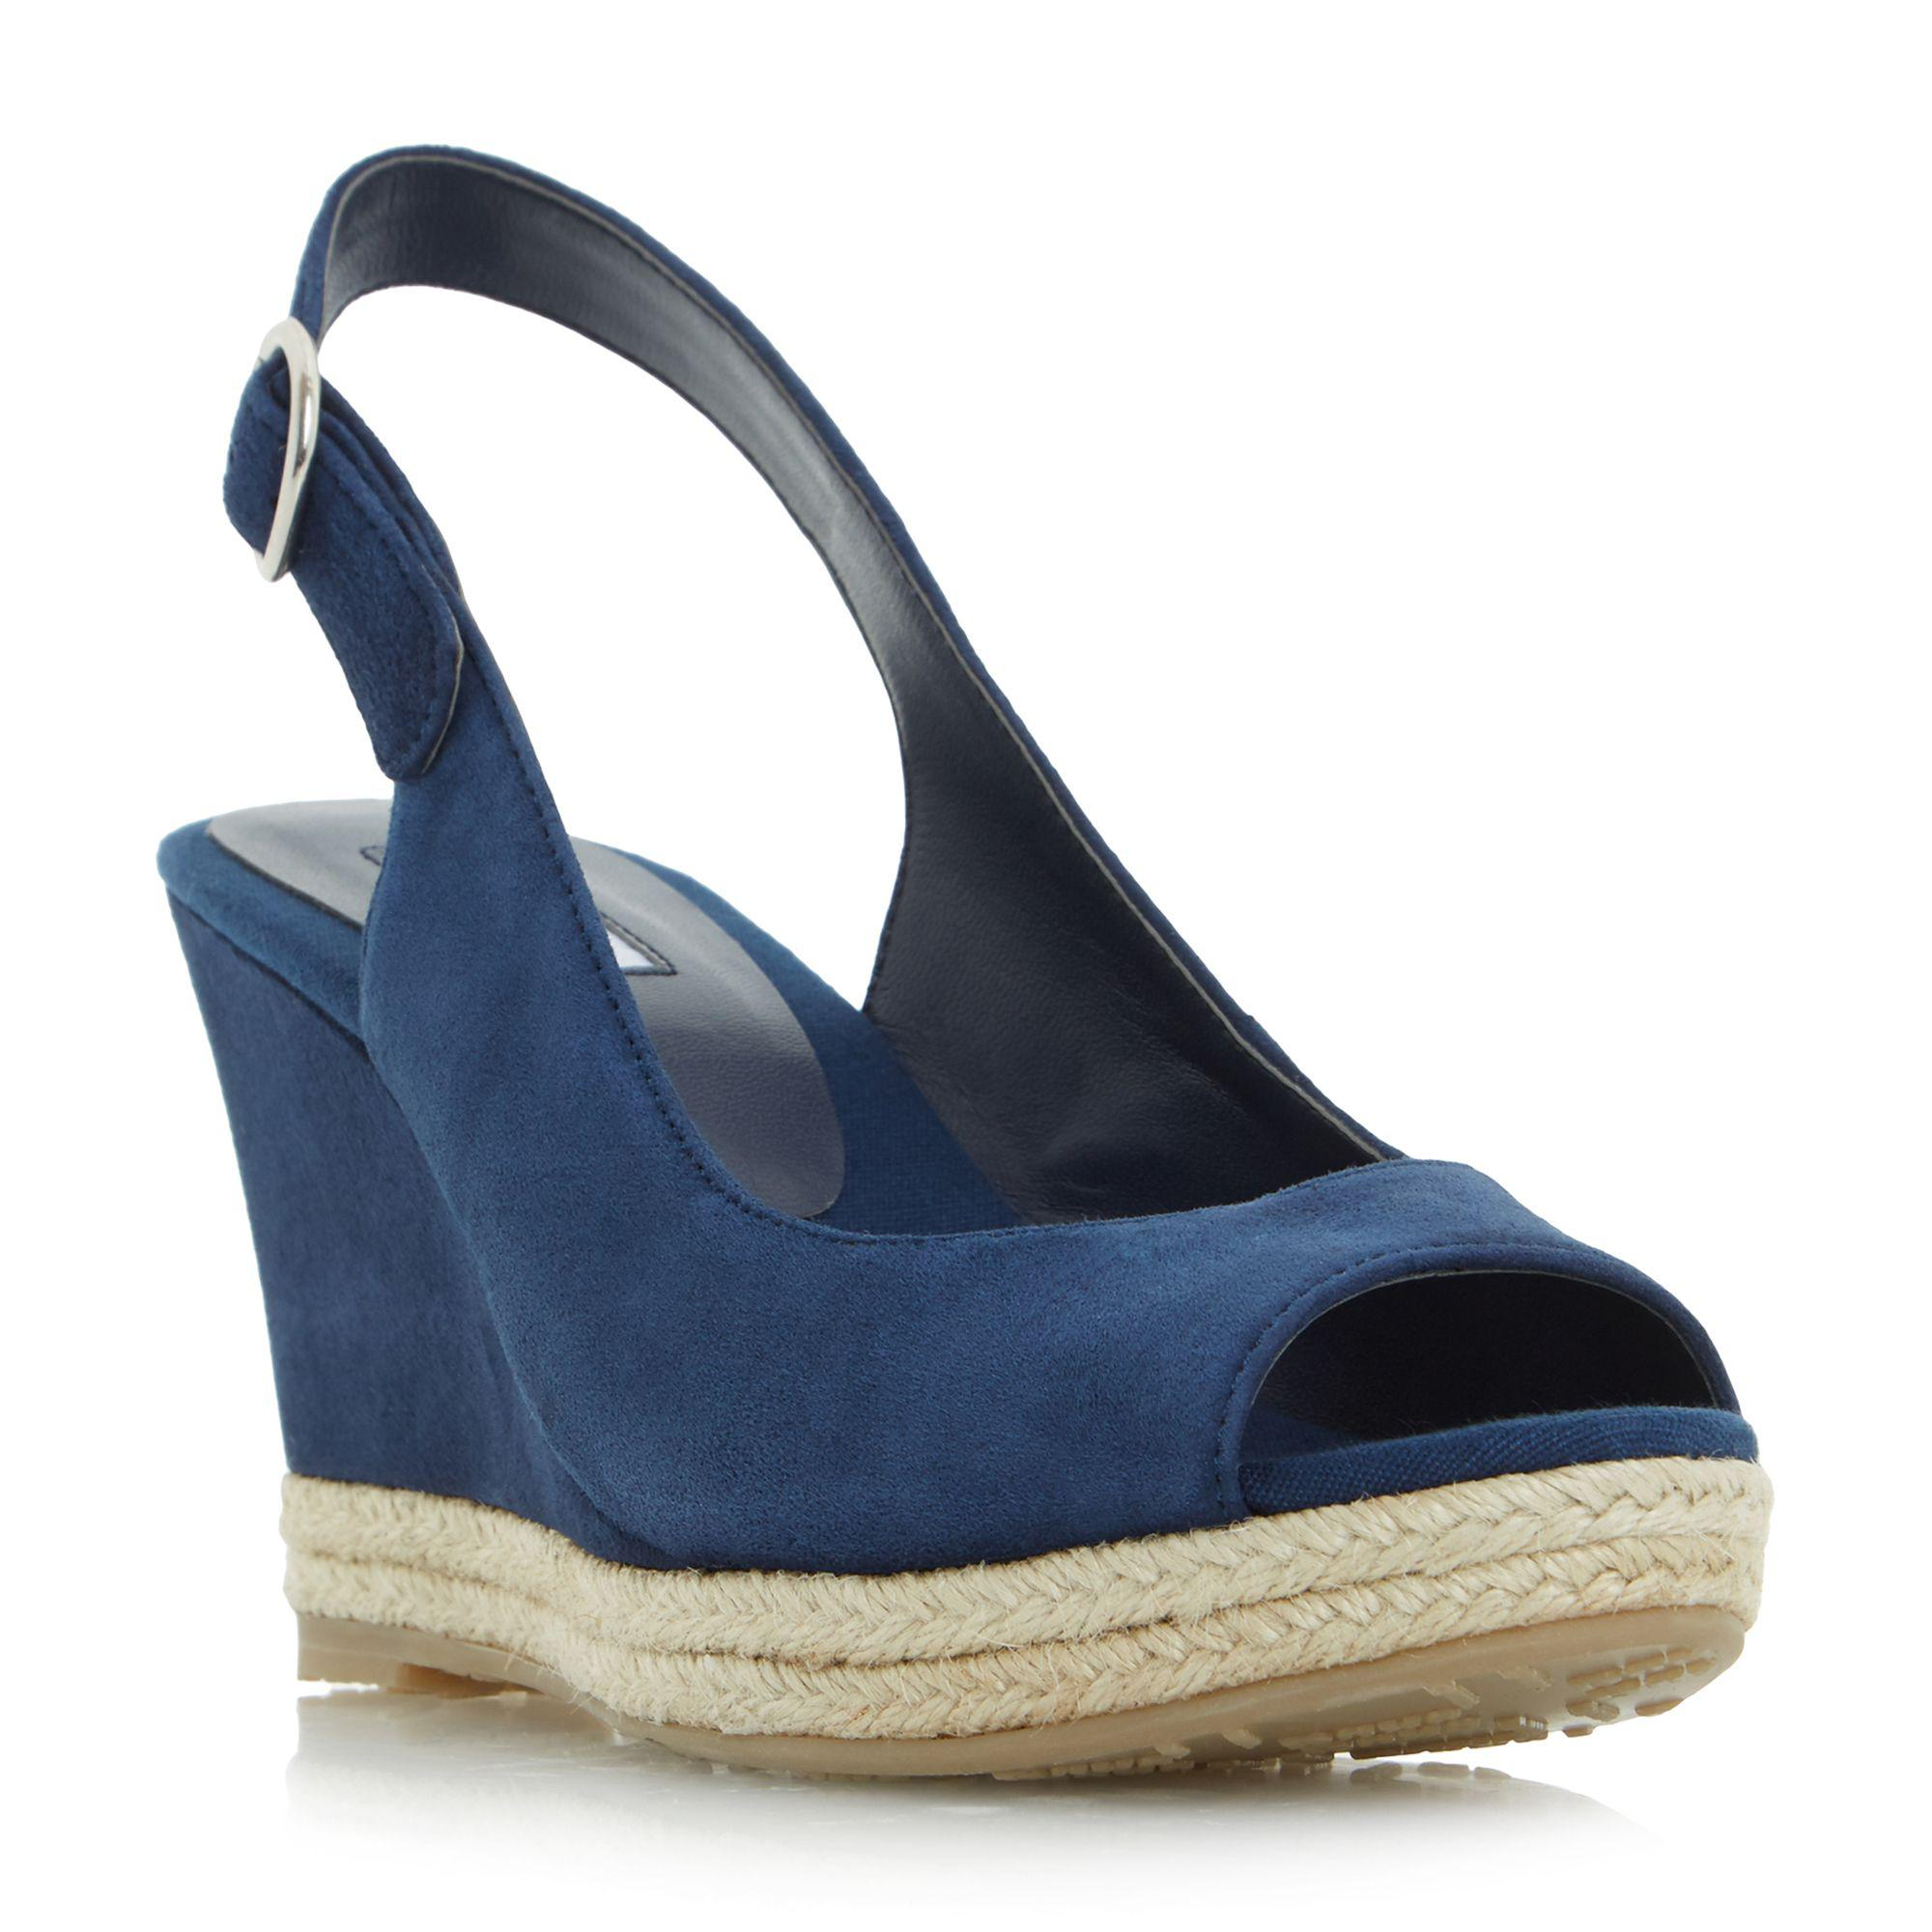 e0315590f4d0 Dune Navy  klick  Espadrille Trim Wedge Sandals in Blue - Lyst